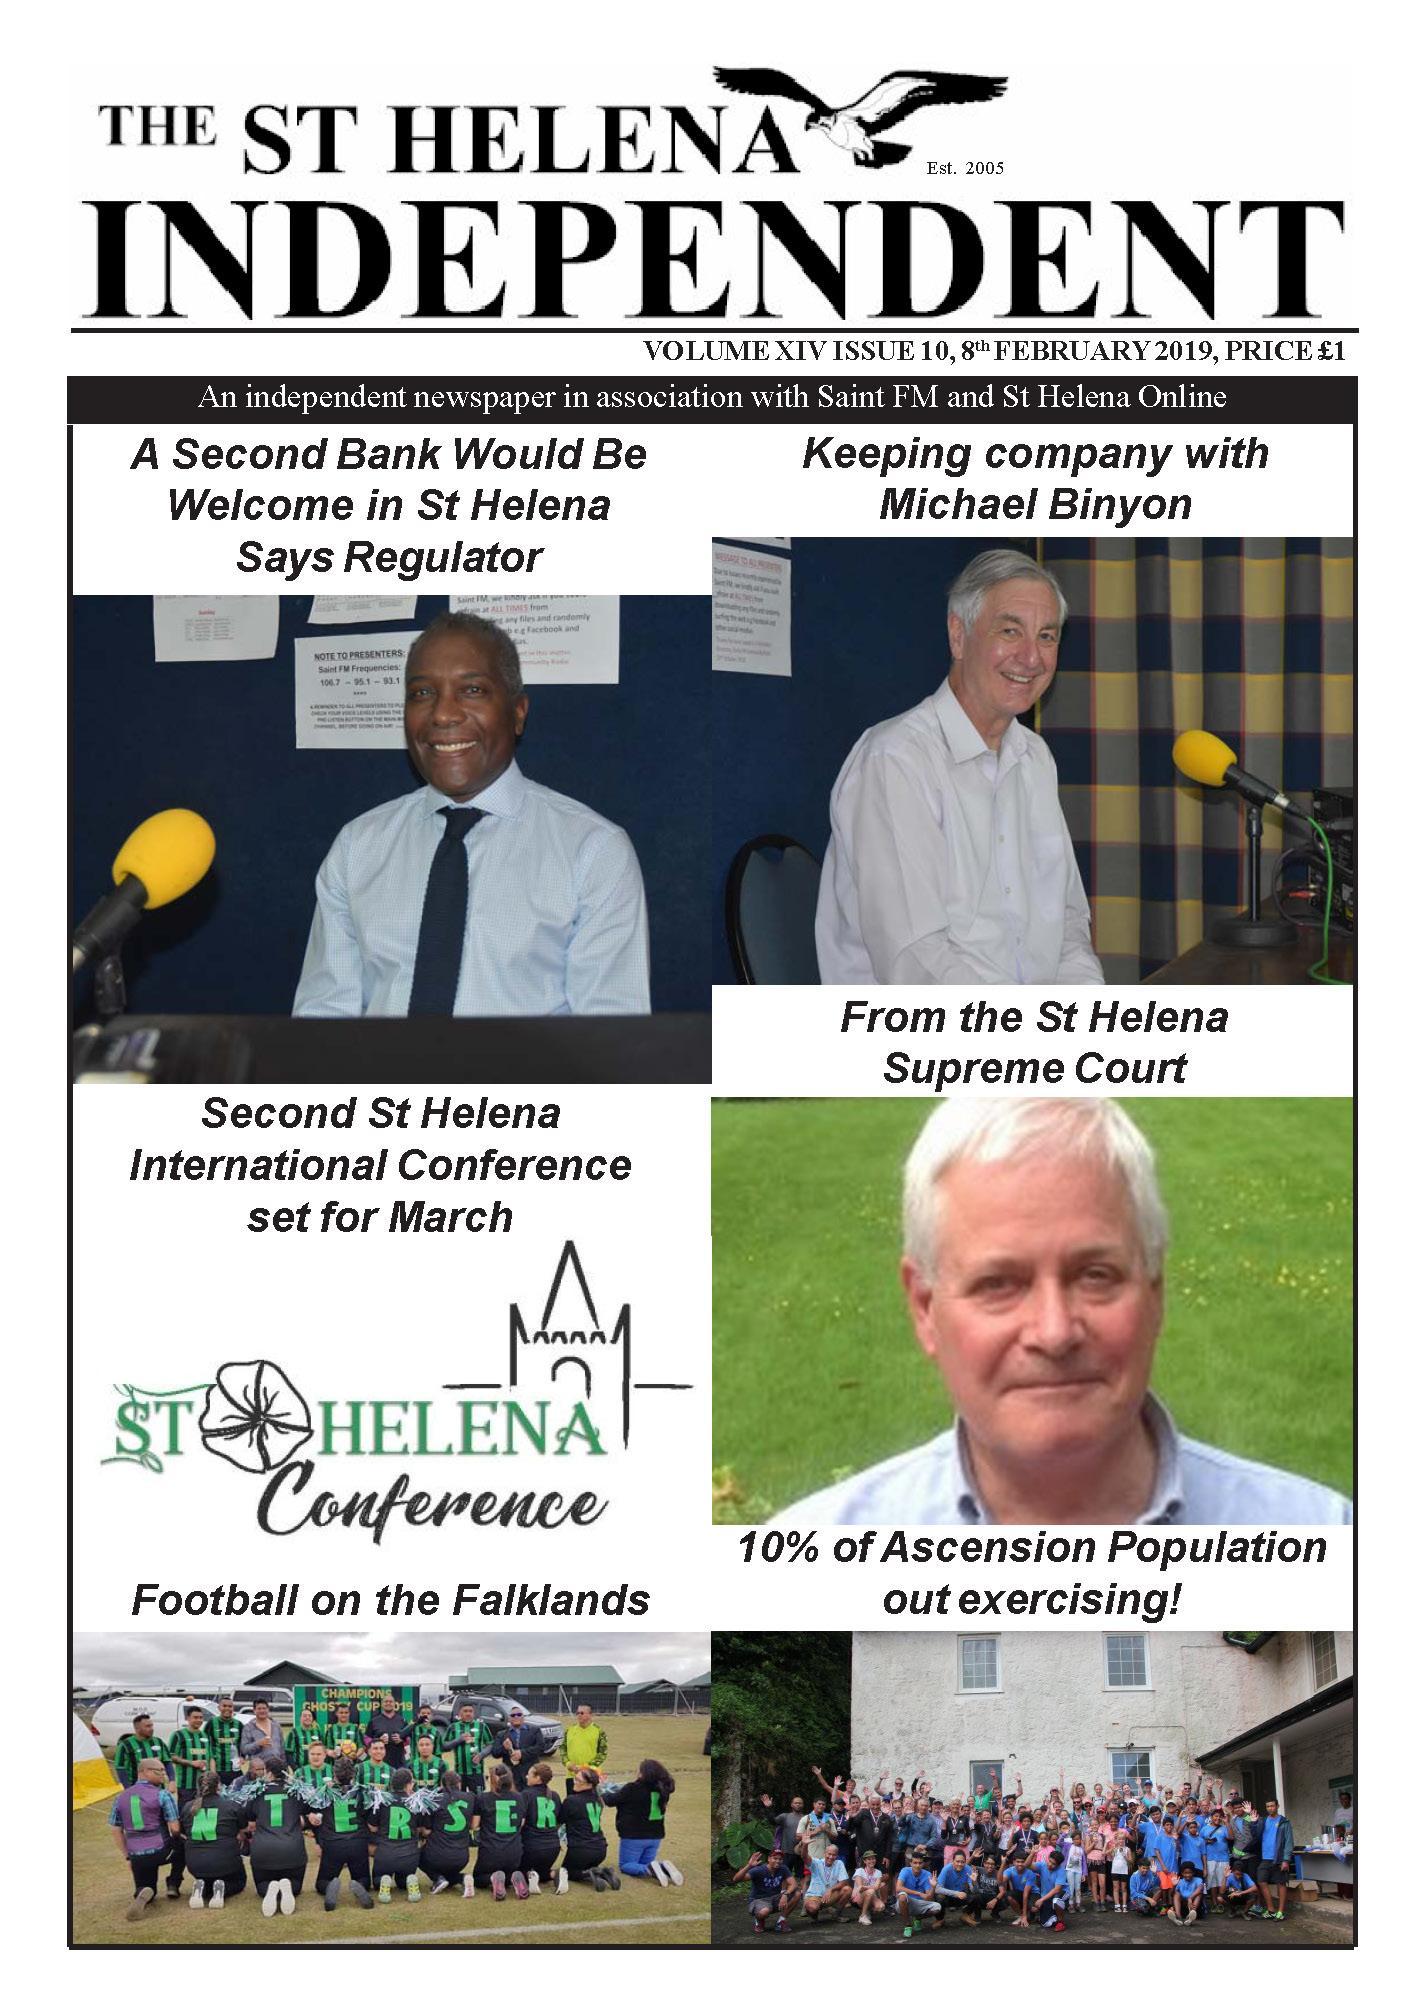 St Helena Independent 20190208